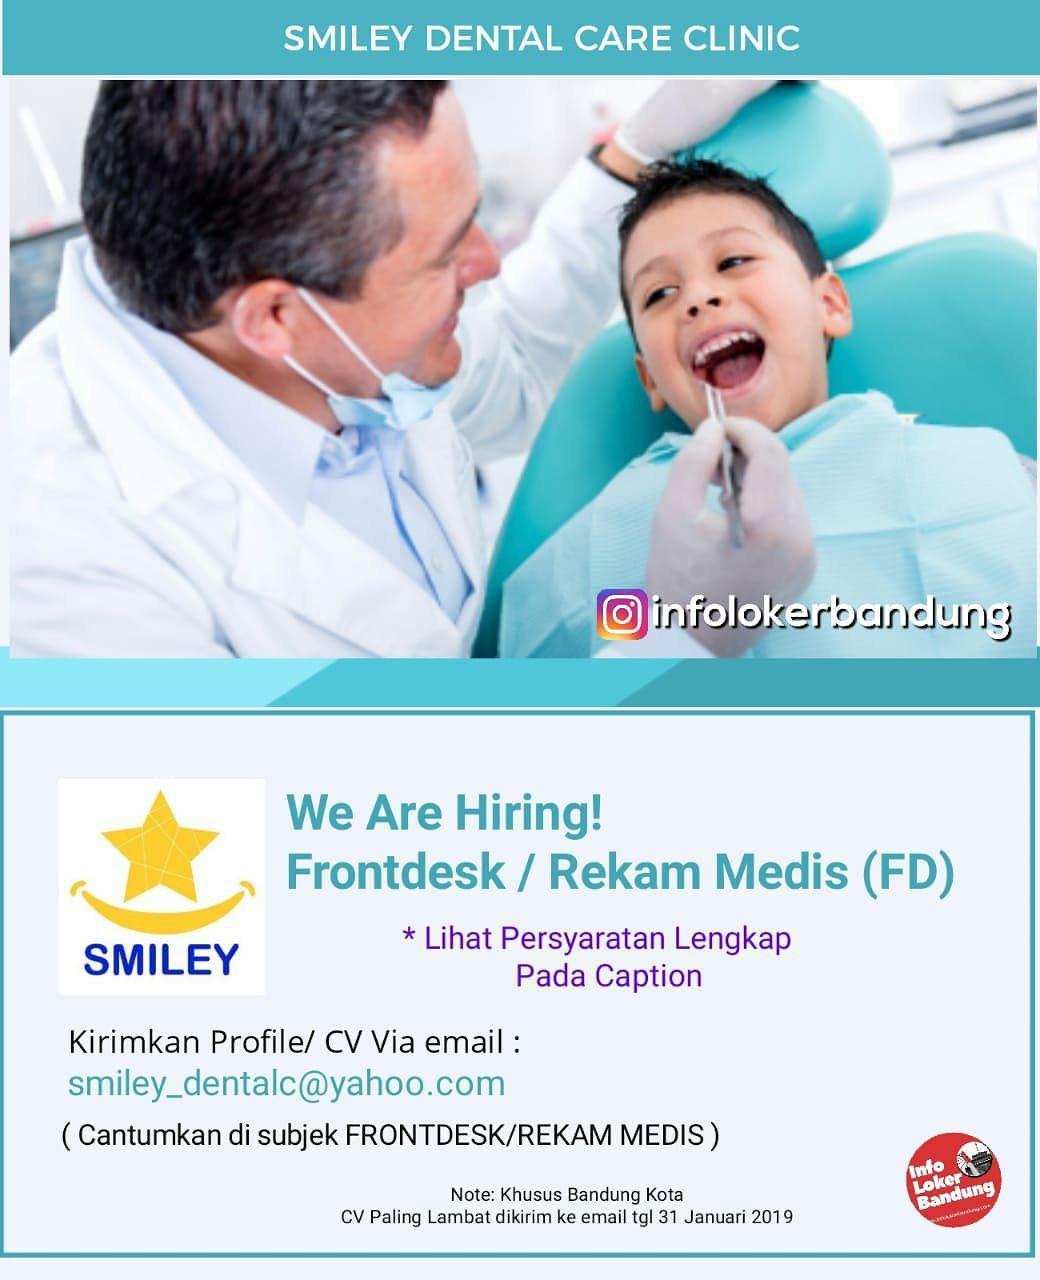 Lowongan Kerja Smiley Dental Care Clinic Bandung Januari 2018